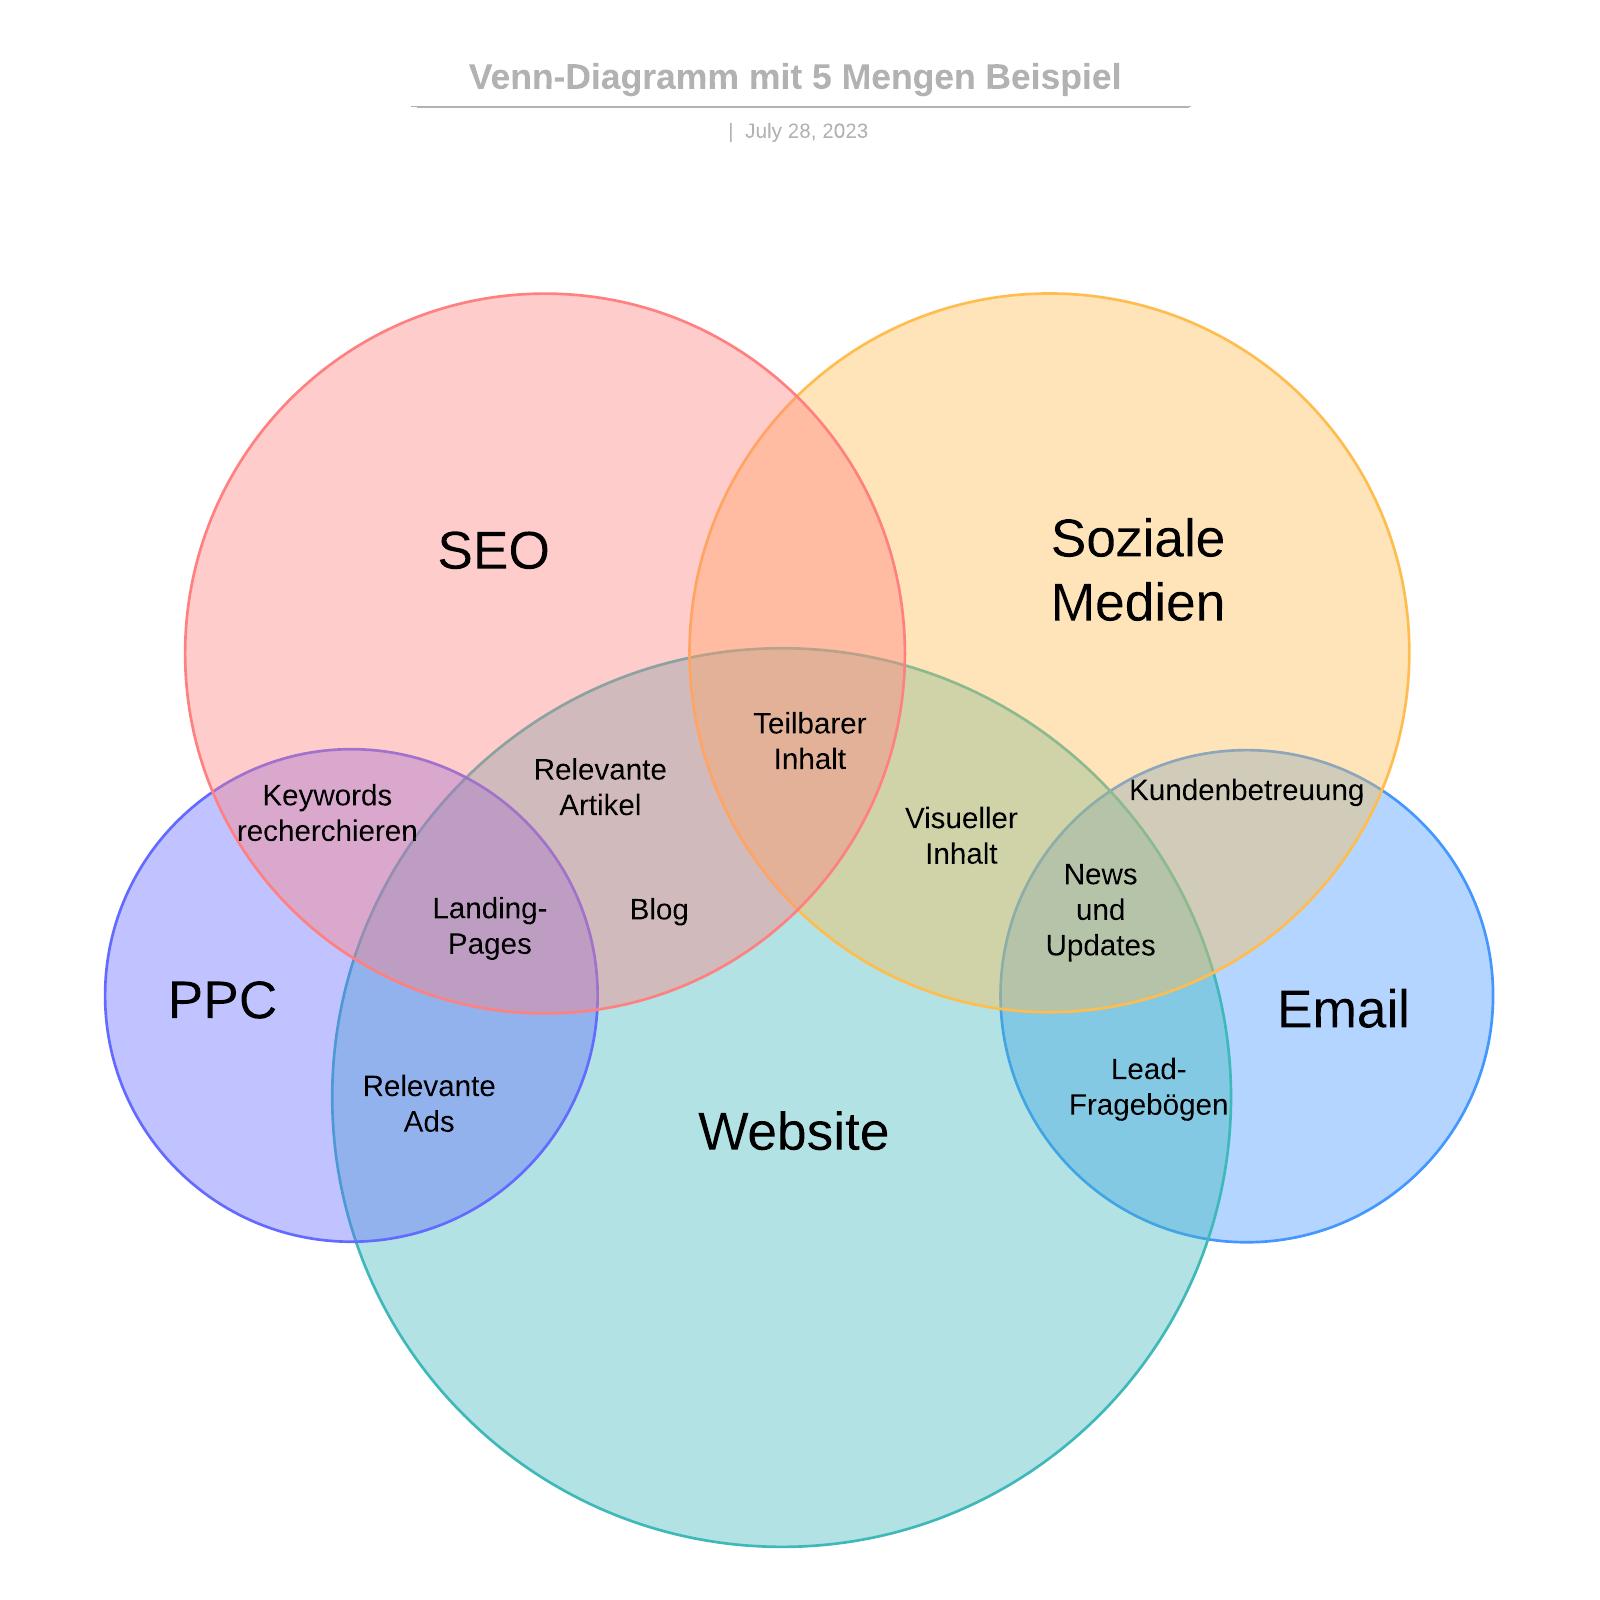 Digitales Marketing Venn-Diagramm Beispiel